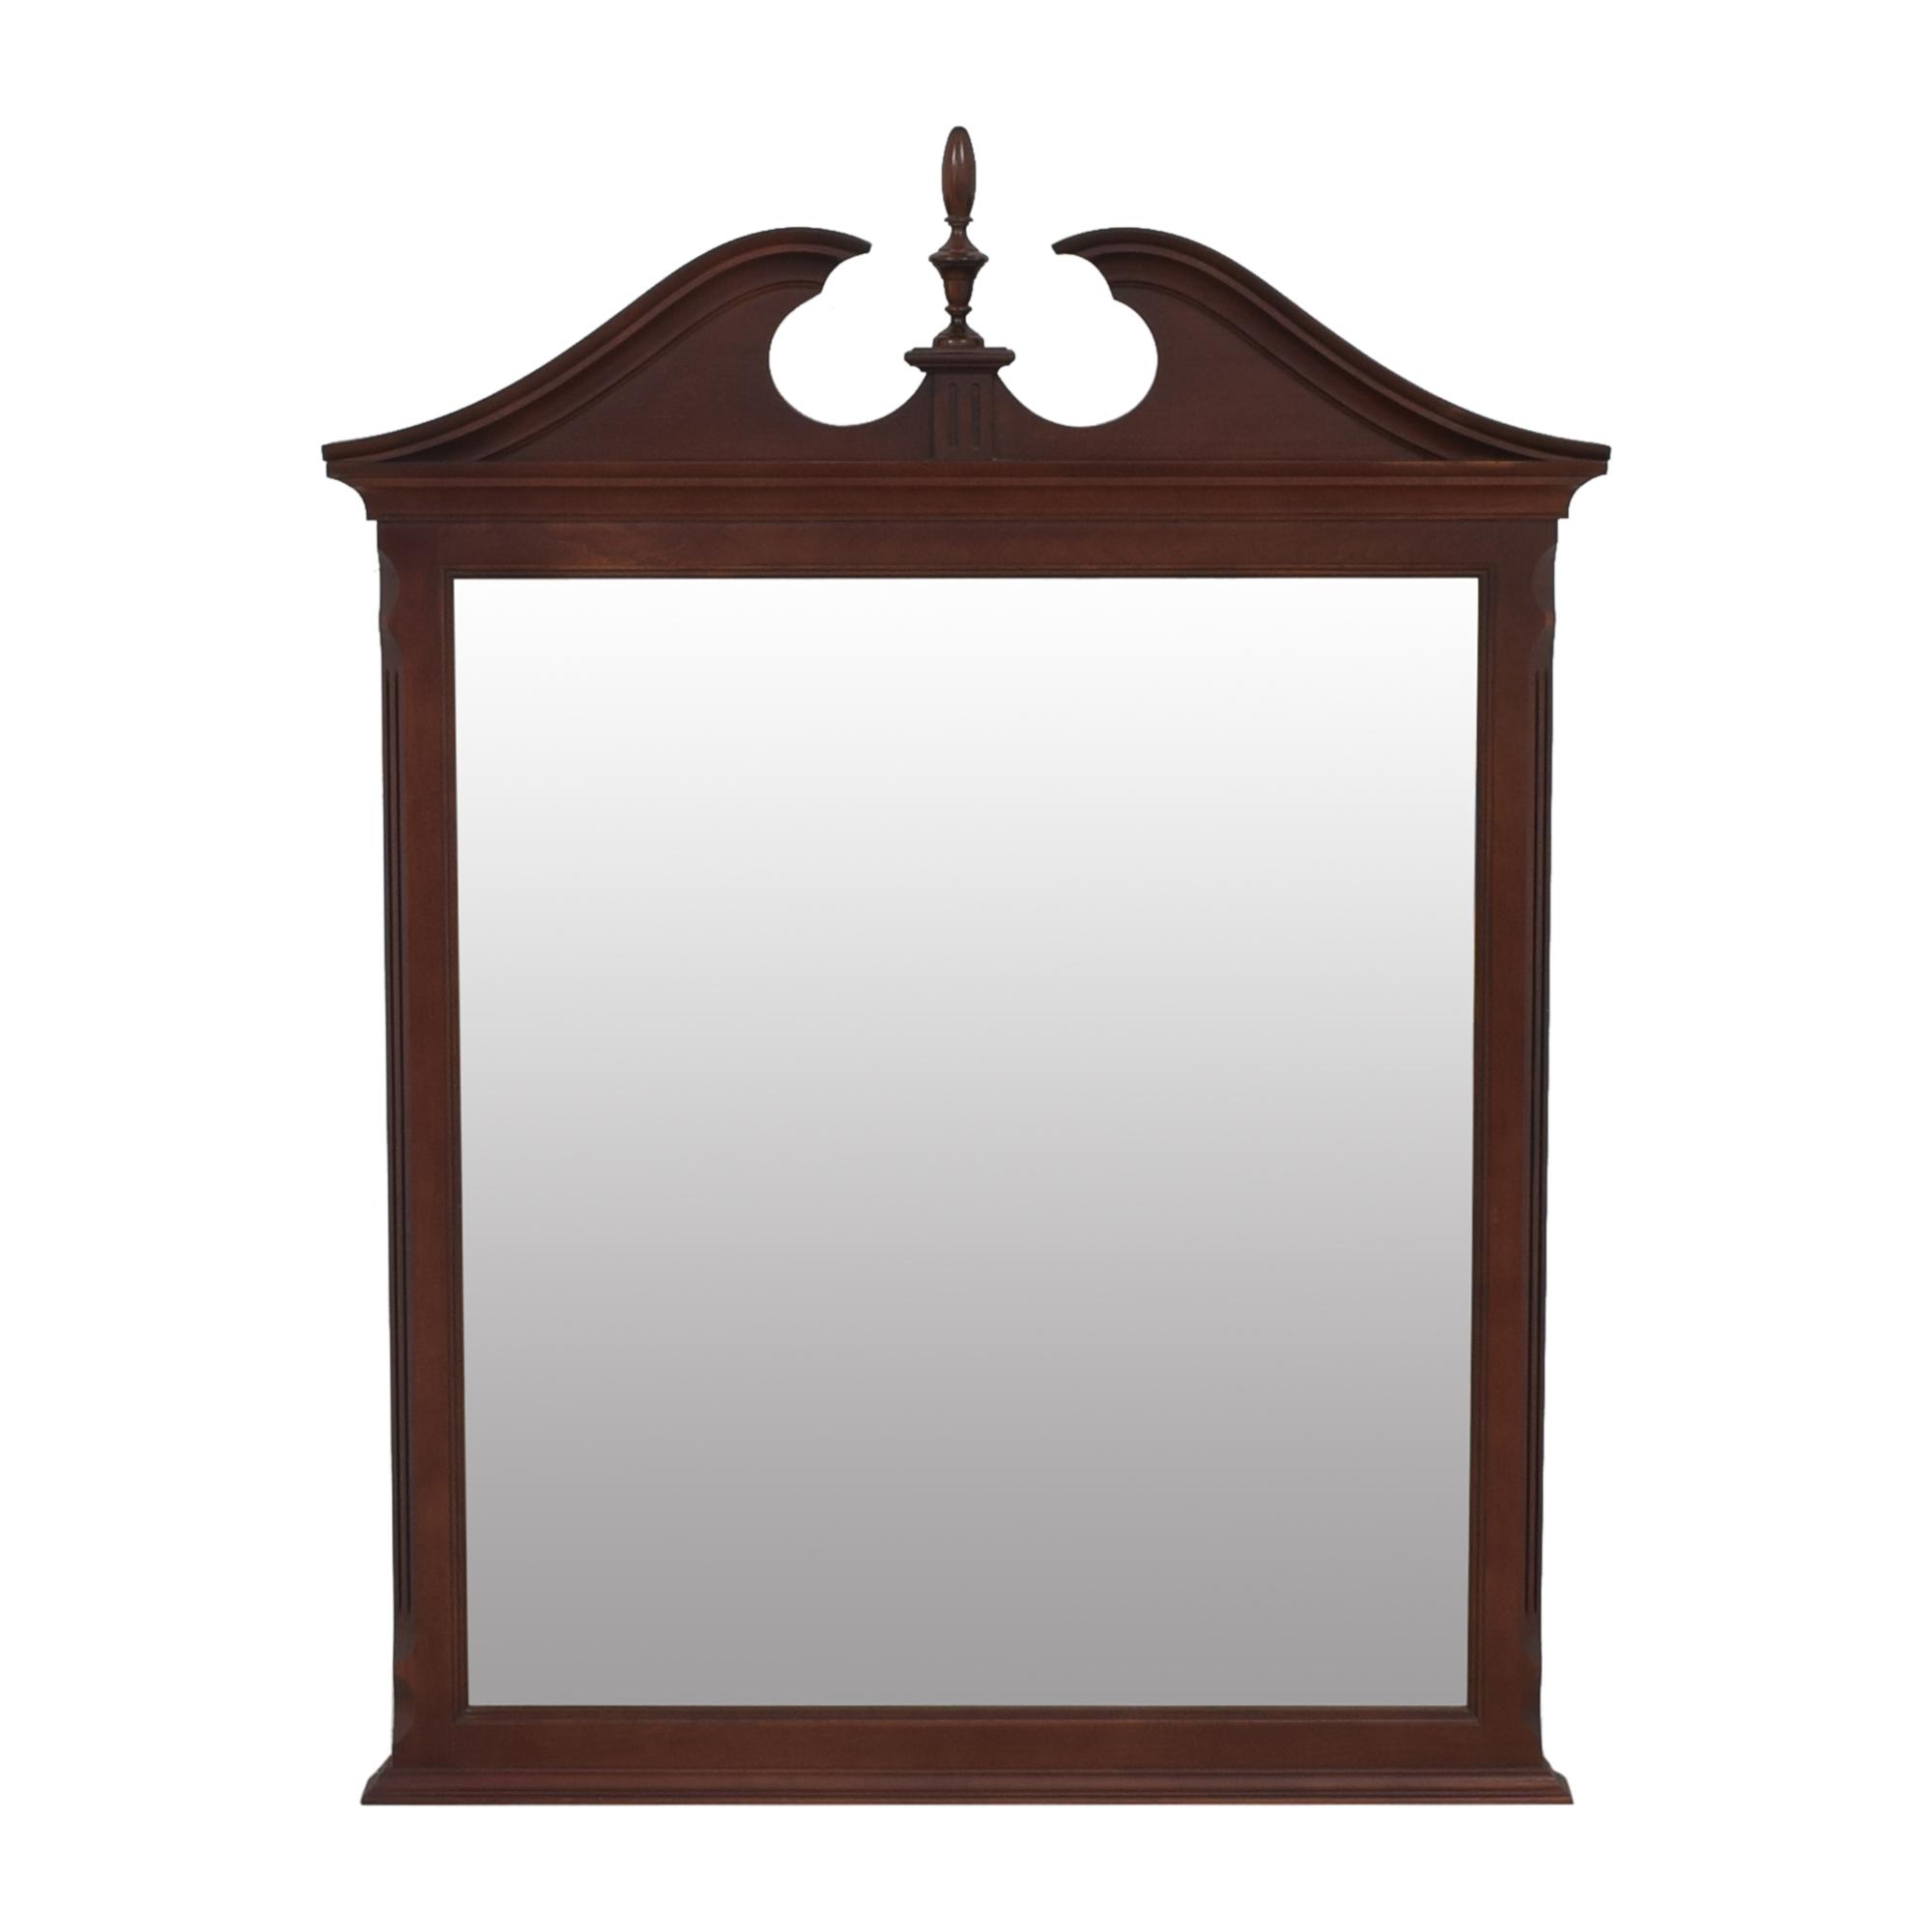 Pennsylvania House Pennsylvania House Carved Mirror discount